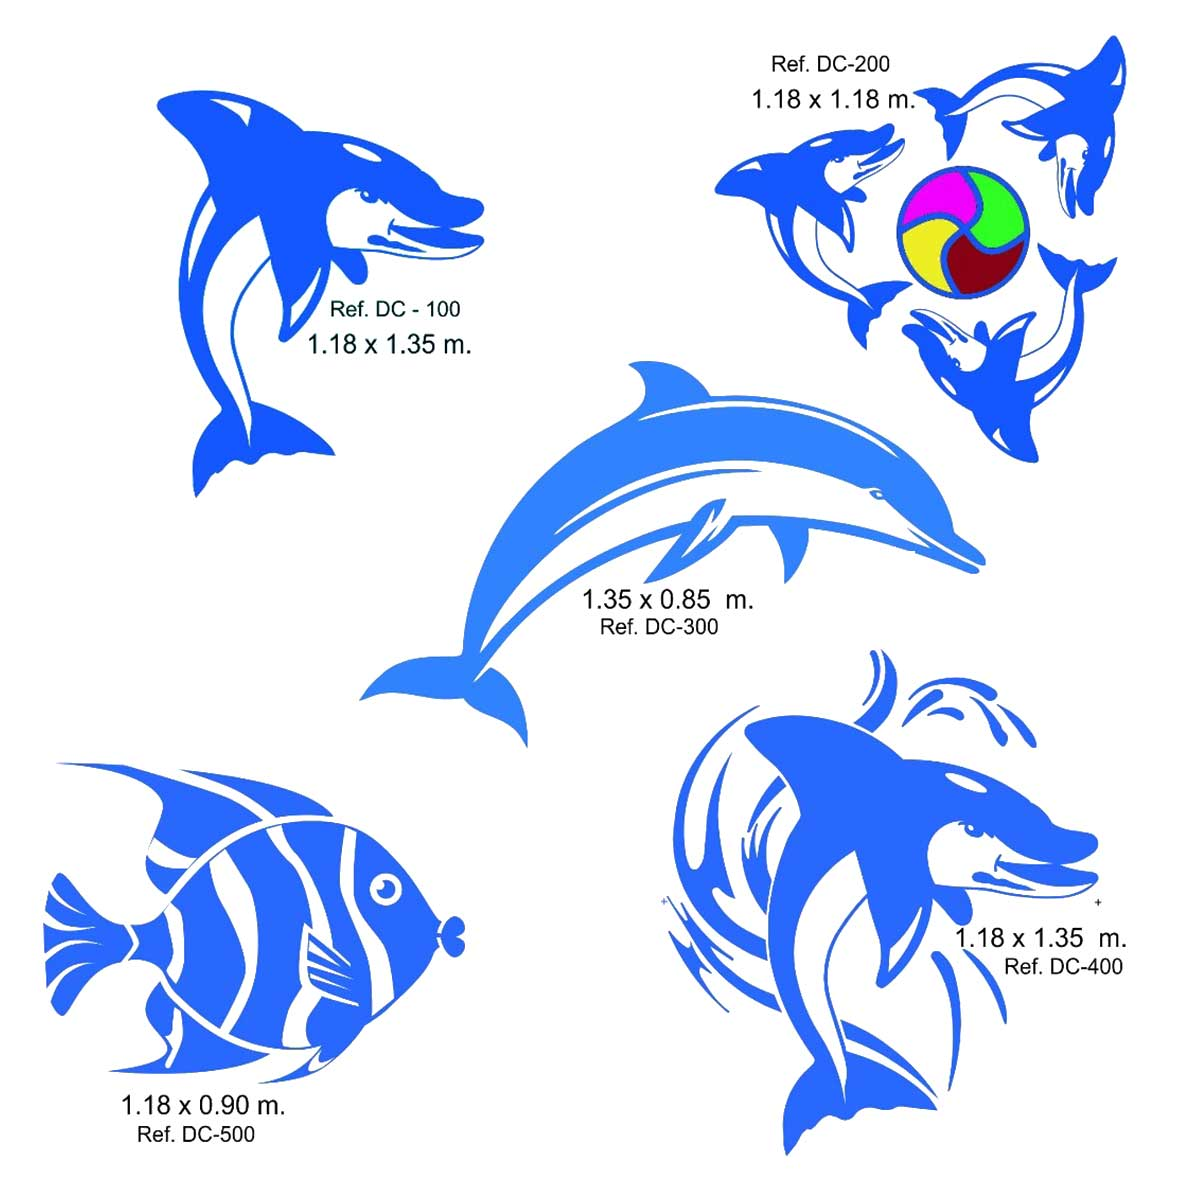 Dibujos para piscinas prefabricadas